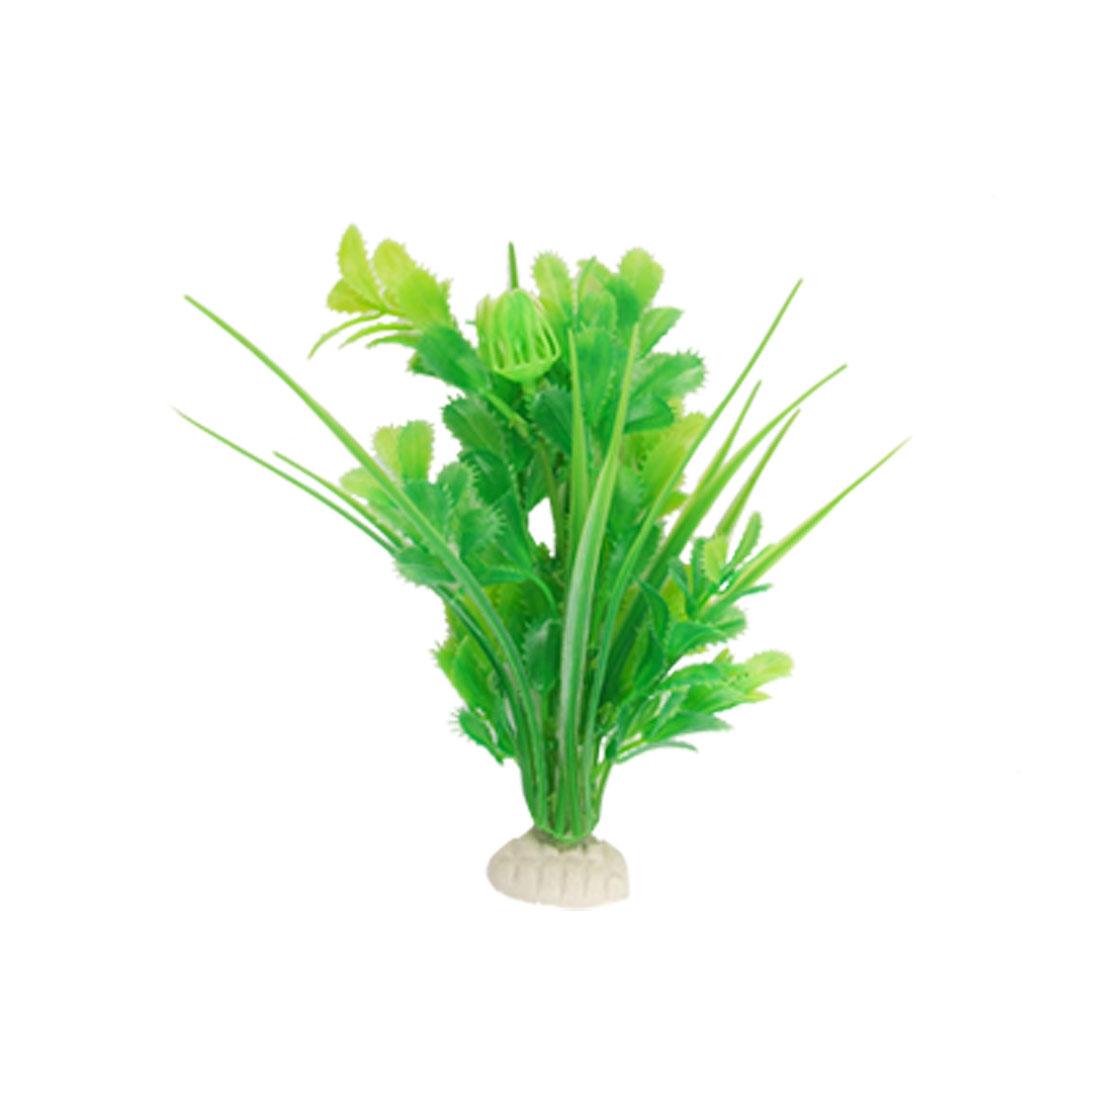 Fish Tank Green Leaf White Flower Plastic Plant Aquascaping